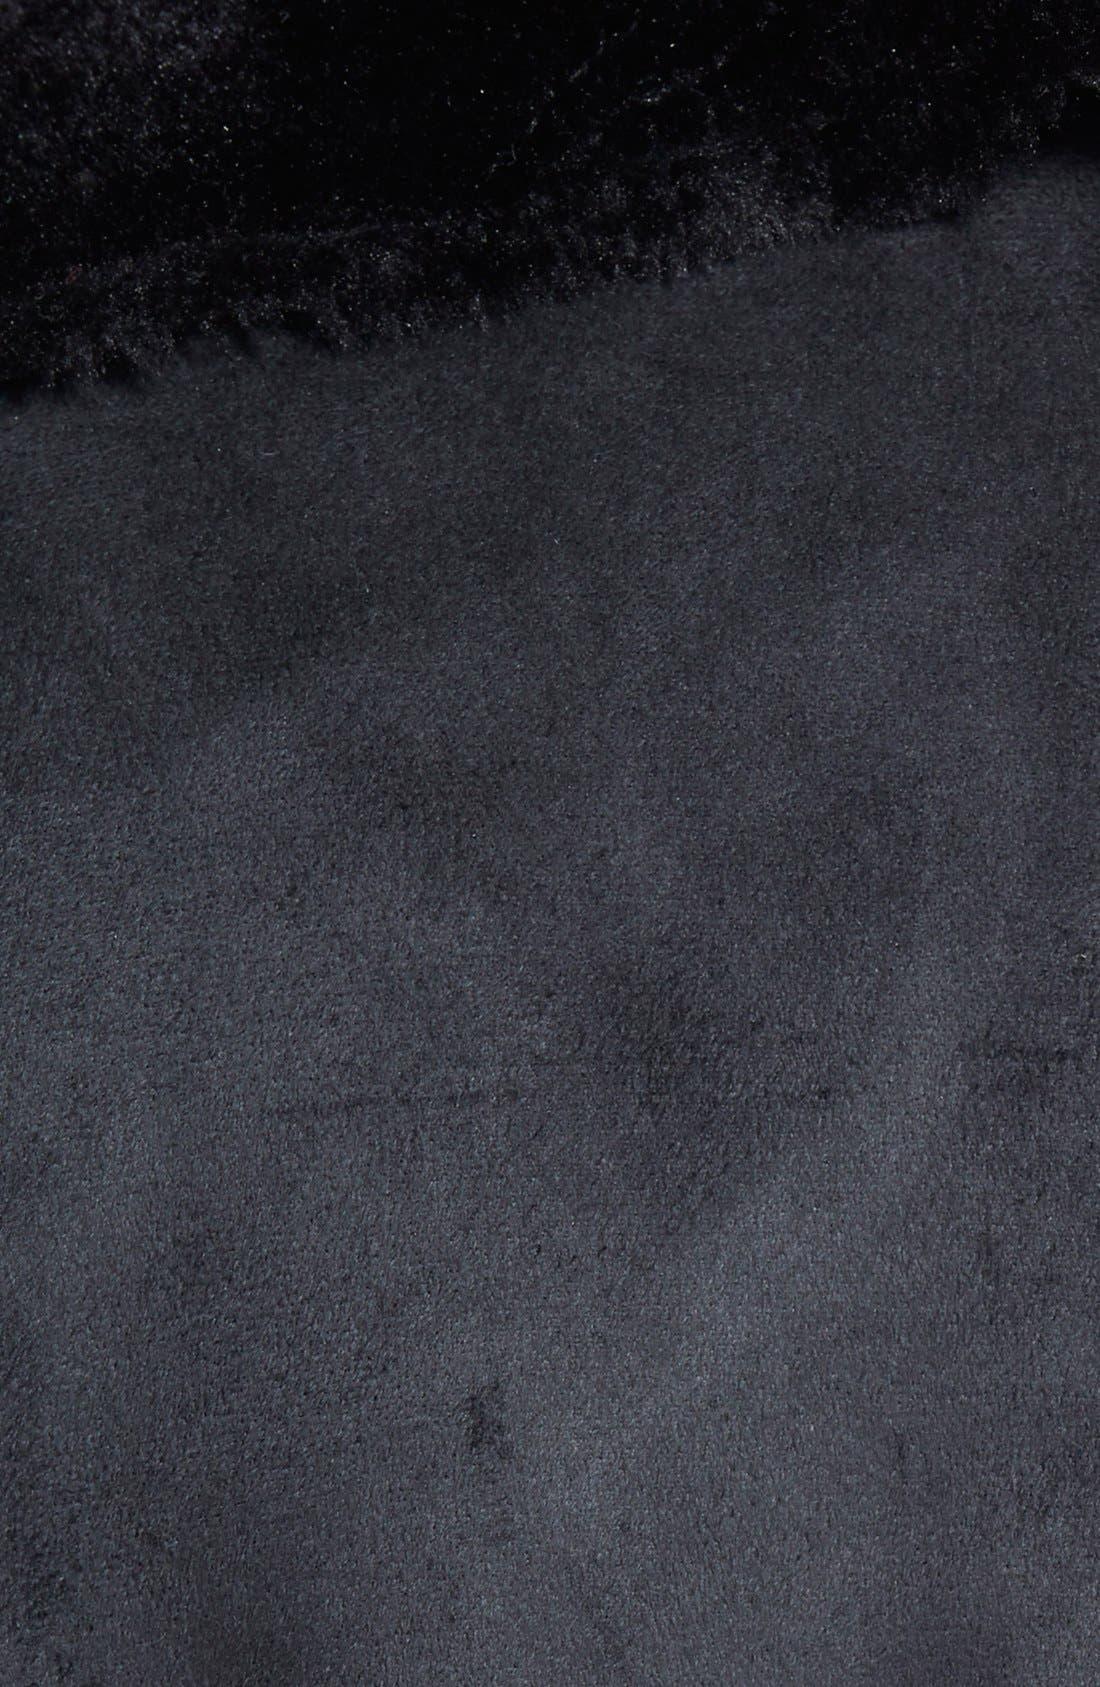 Velvet Faux Shearling Coat,                             Alternate thumbnail 3, color,                             001